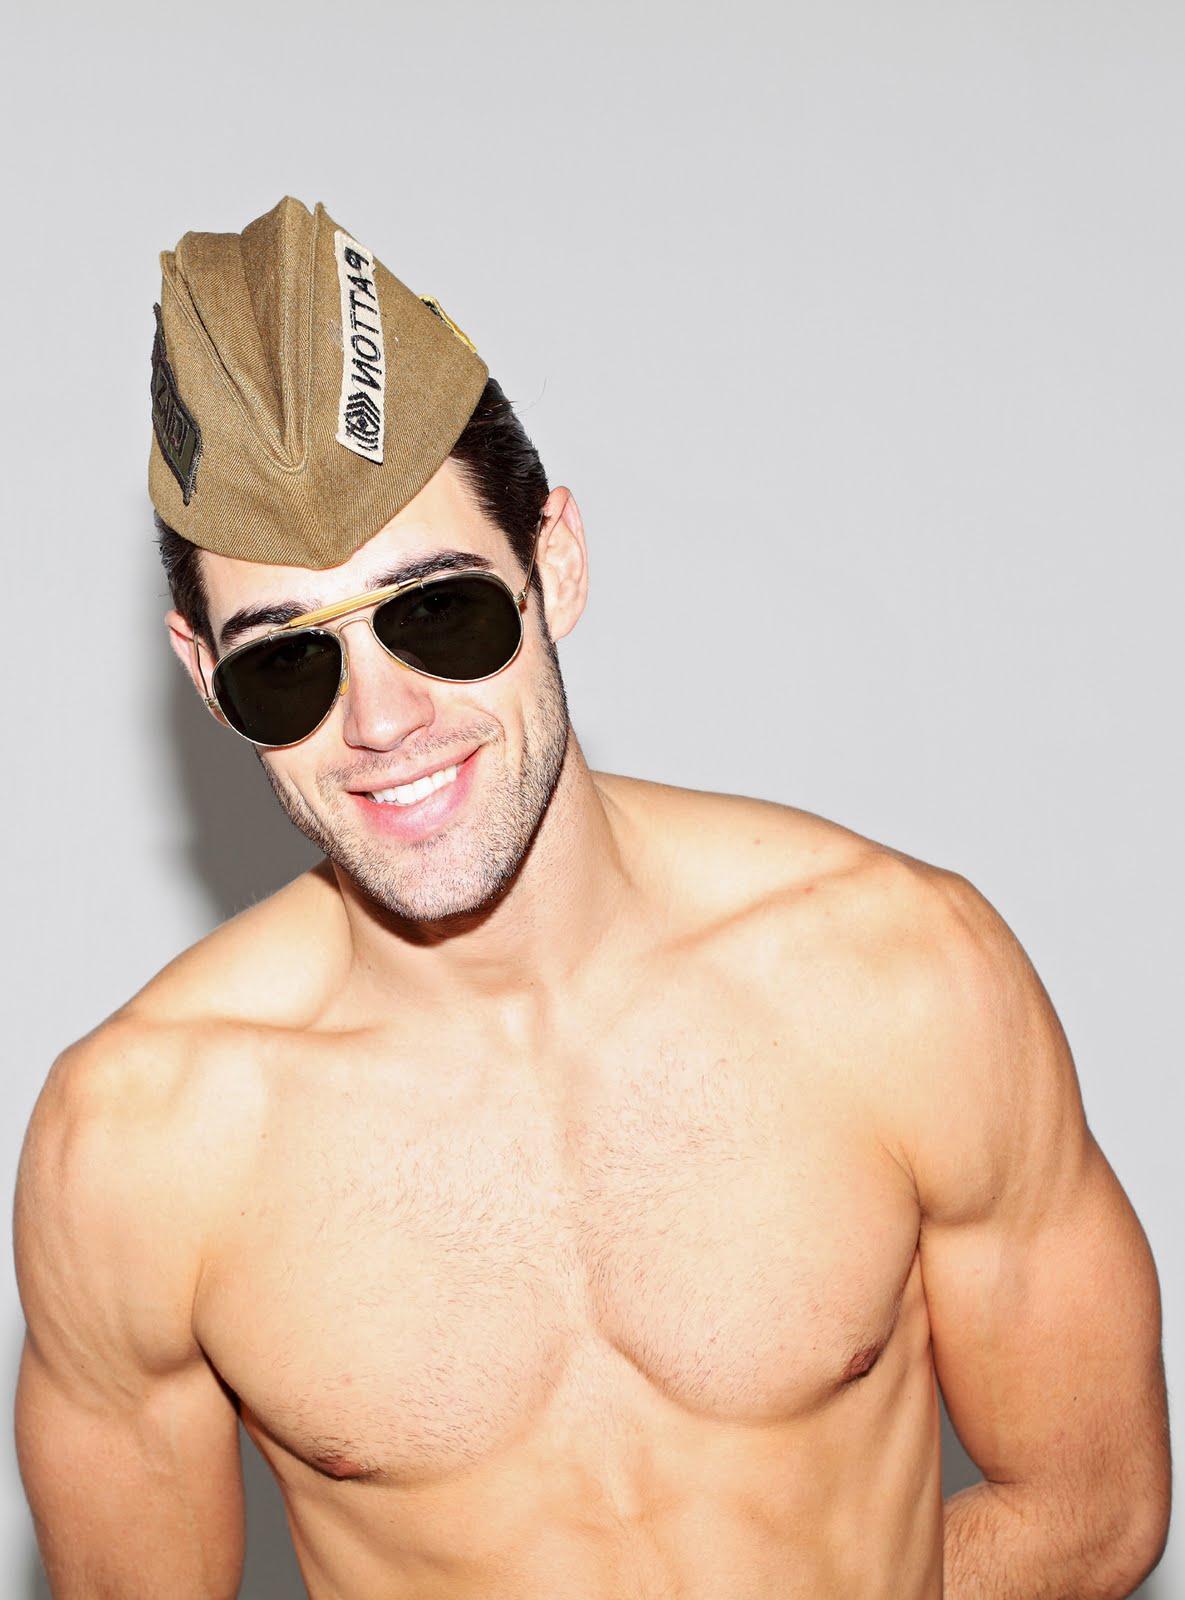 Chad 4 gay